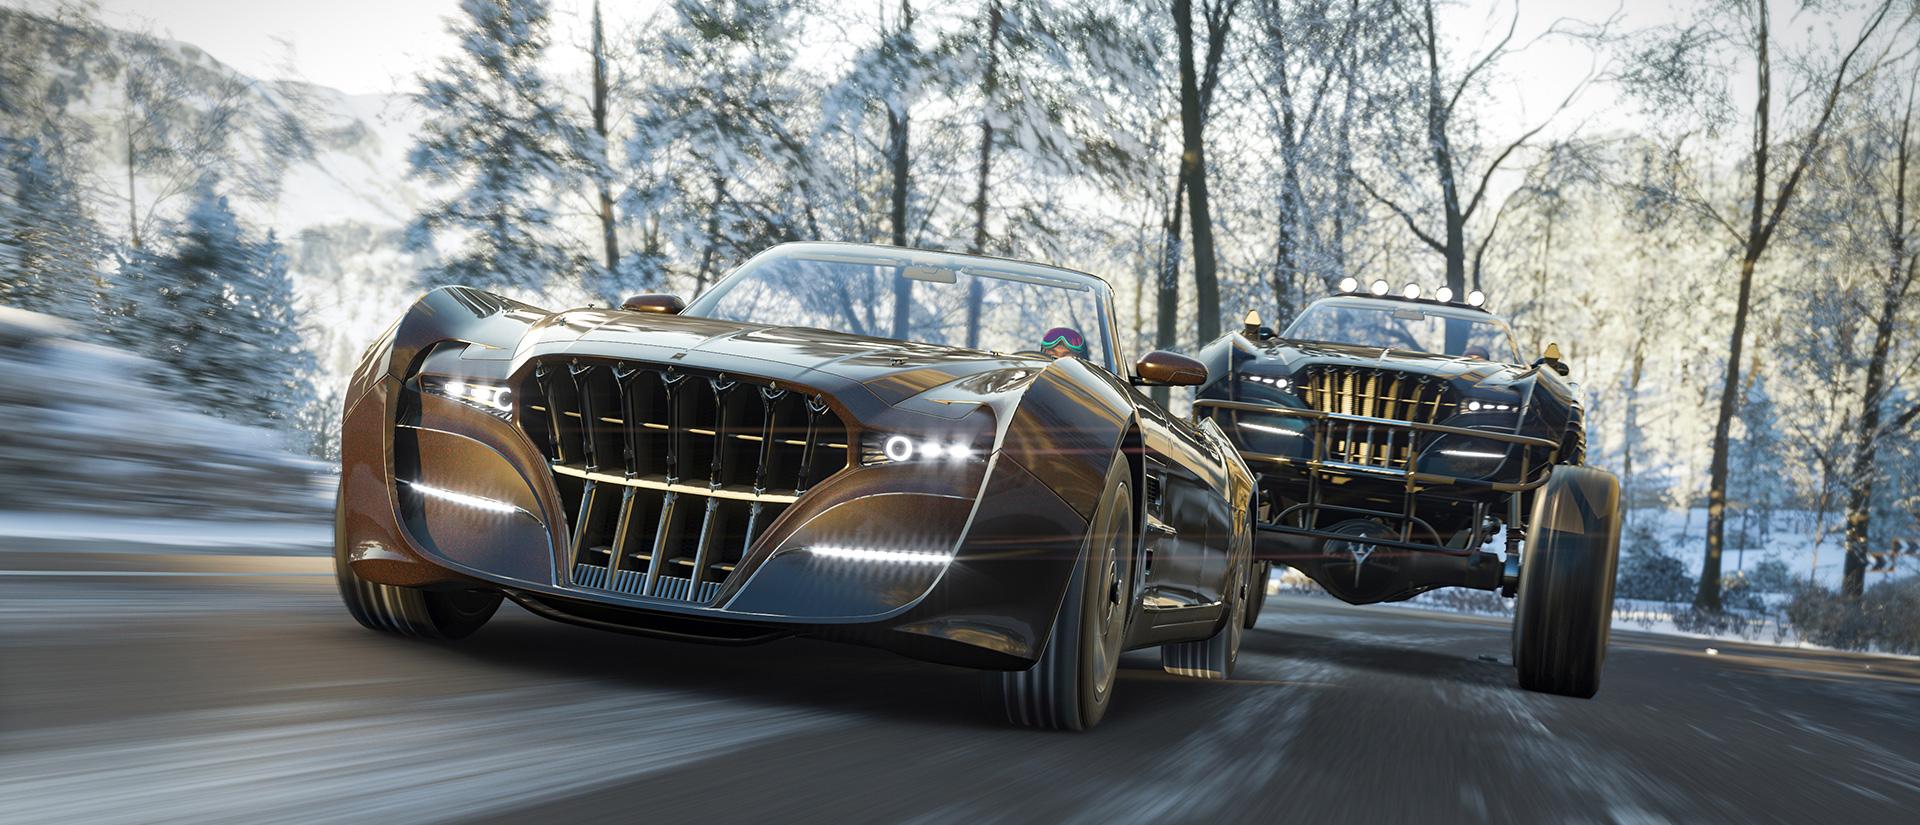 Final Fantasy XV's Regalia is gearing up for a Forza Horizon 4 road trip screenshot